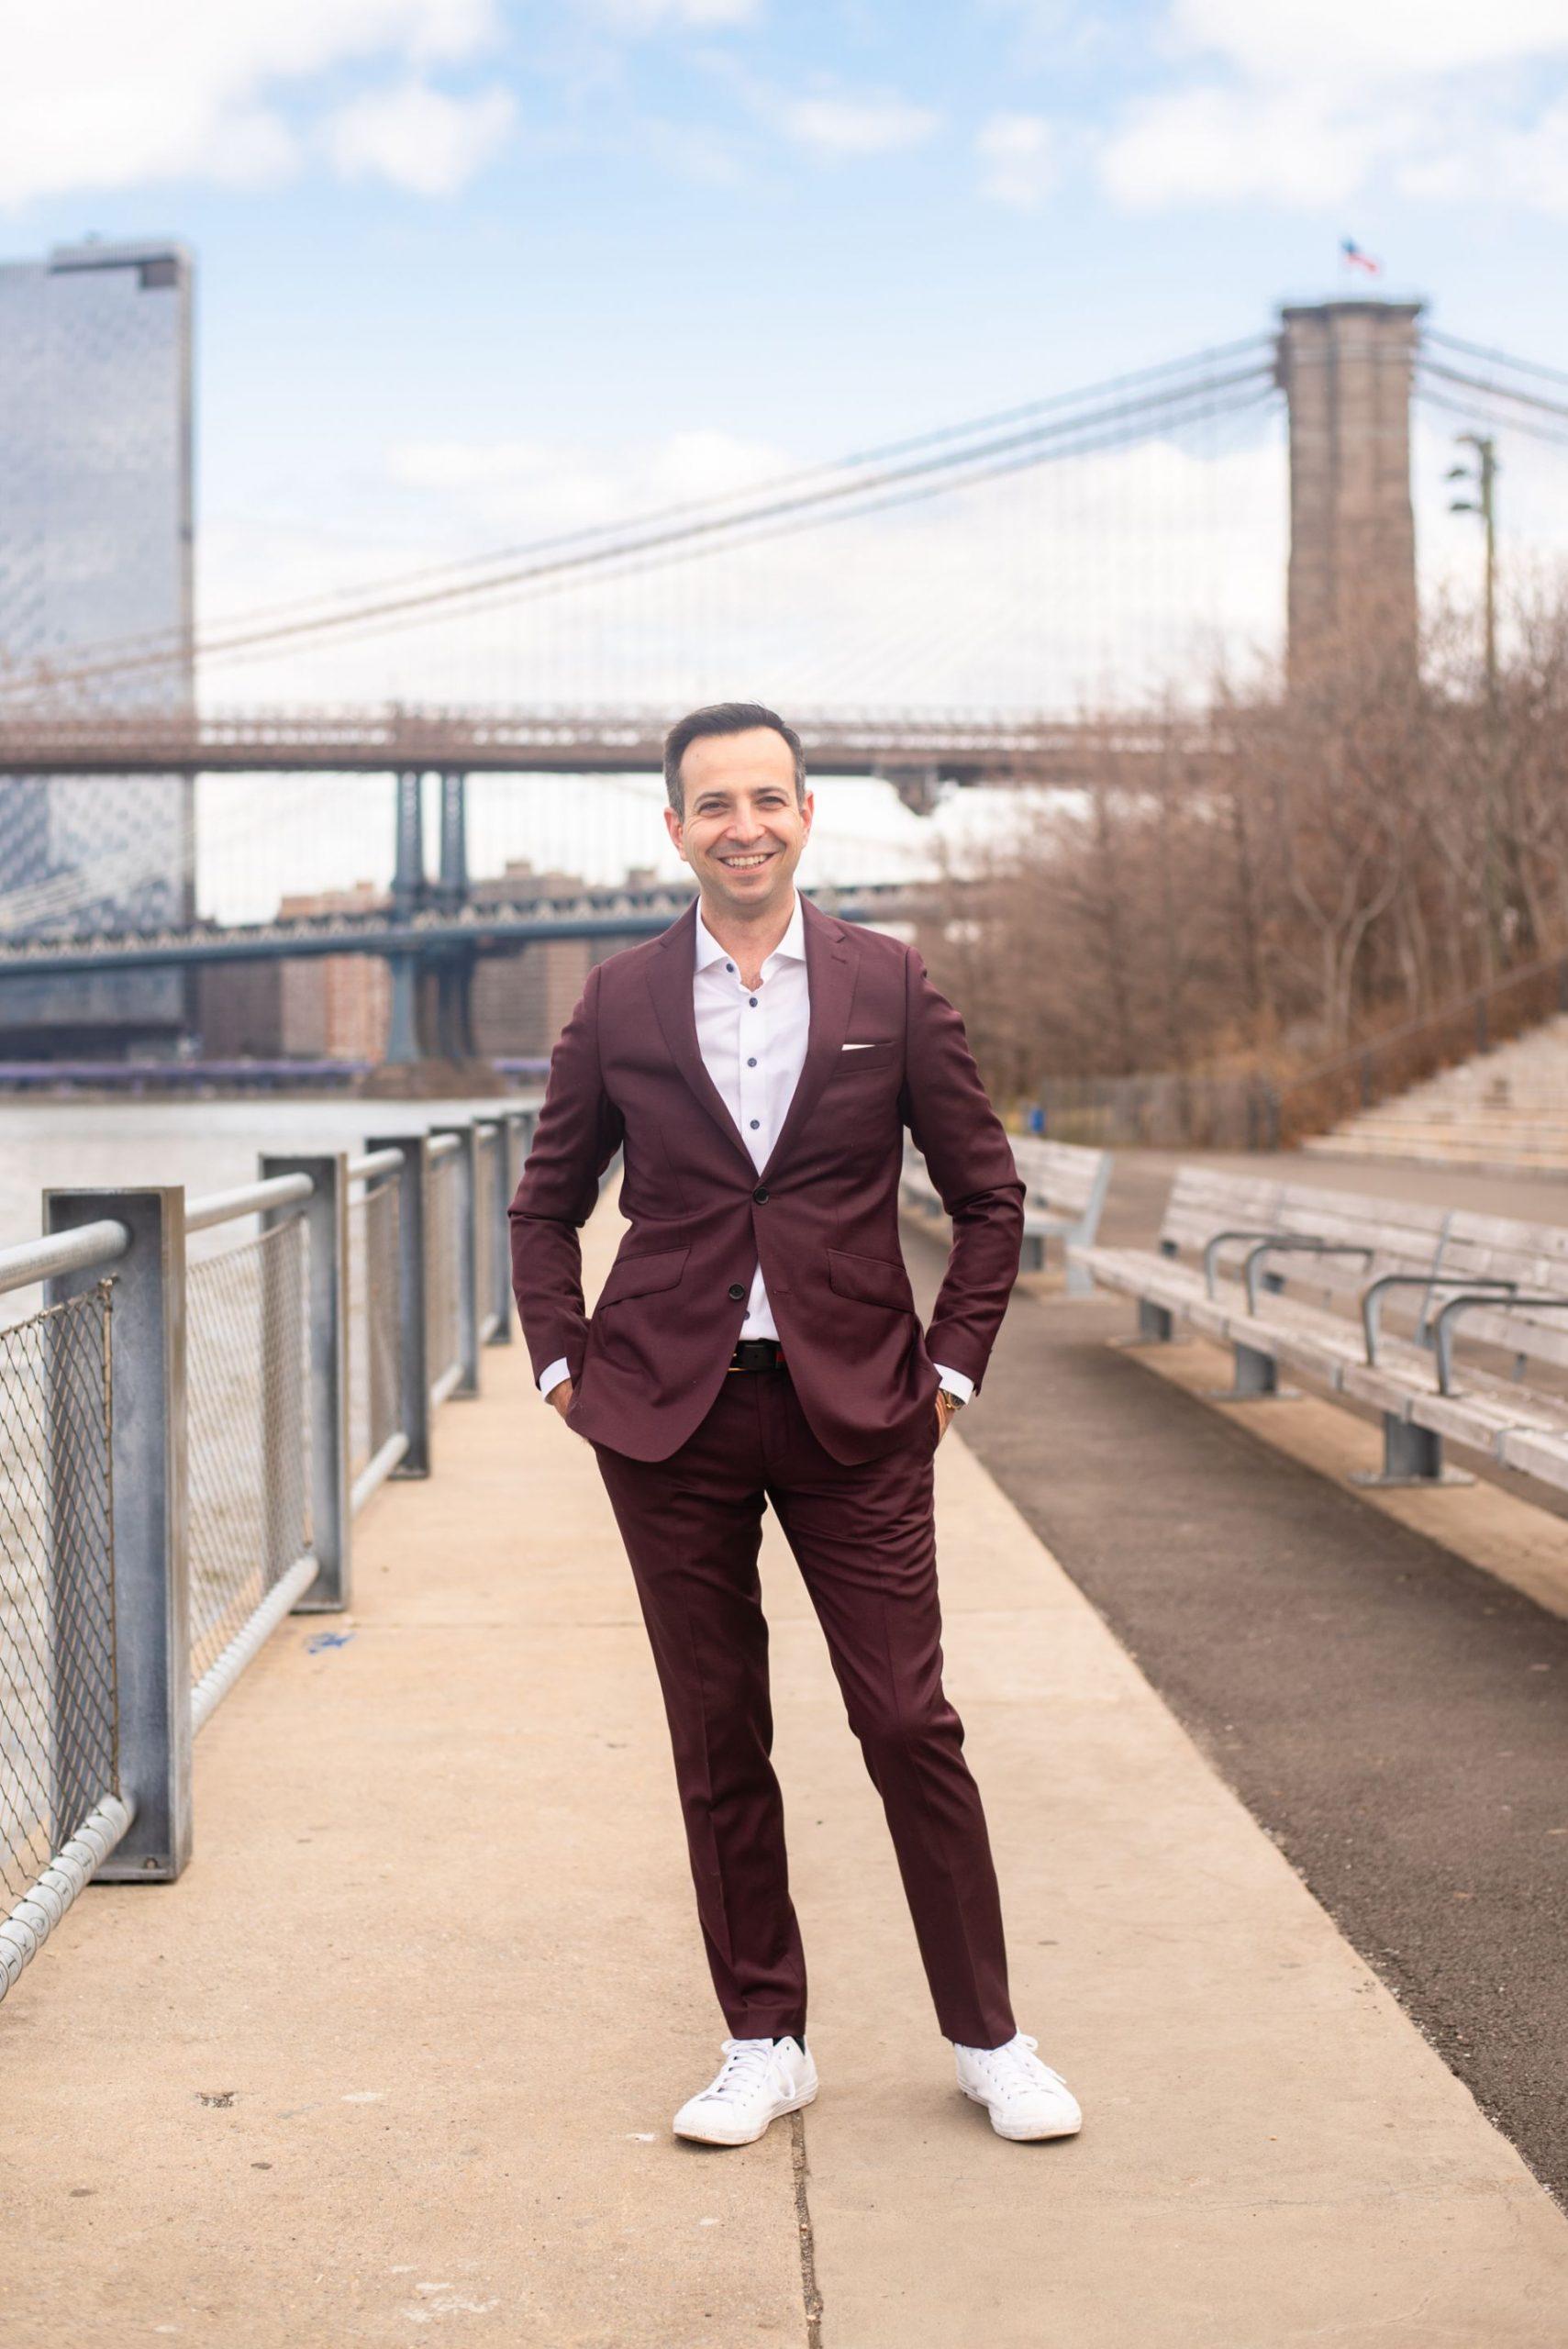 Brooklyn Bridge photoshoot inspiration - Karya Schanilec Photography